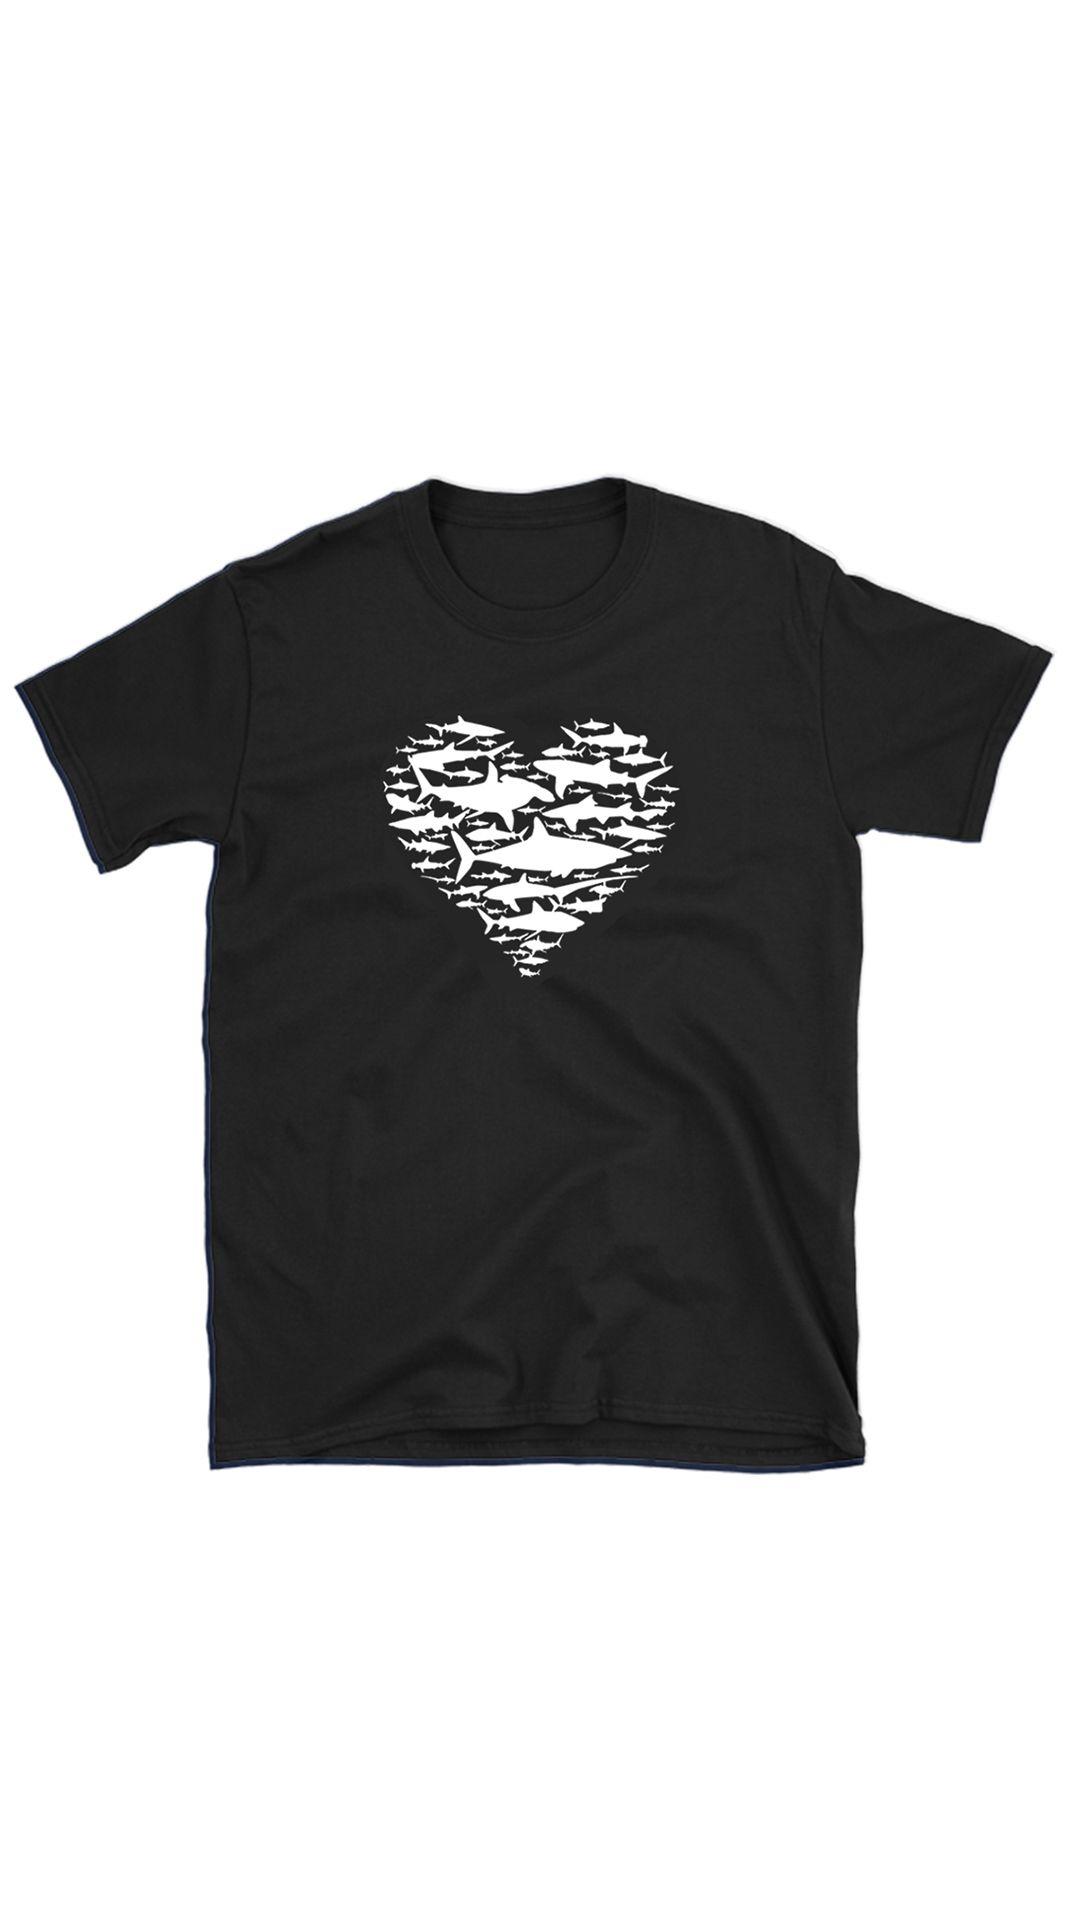 af5c68e1 (t-shirt shark, shark lover, t-shirt shark heart, white shark unisex tshirt,  shark lover, cotton tee, ocean design)